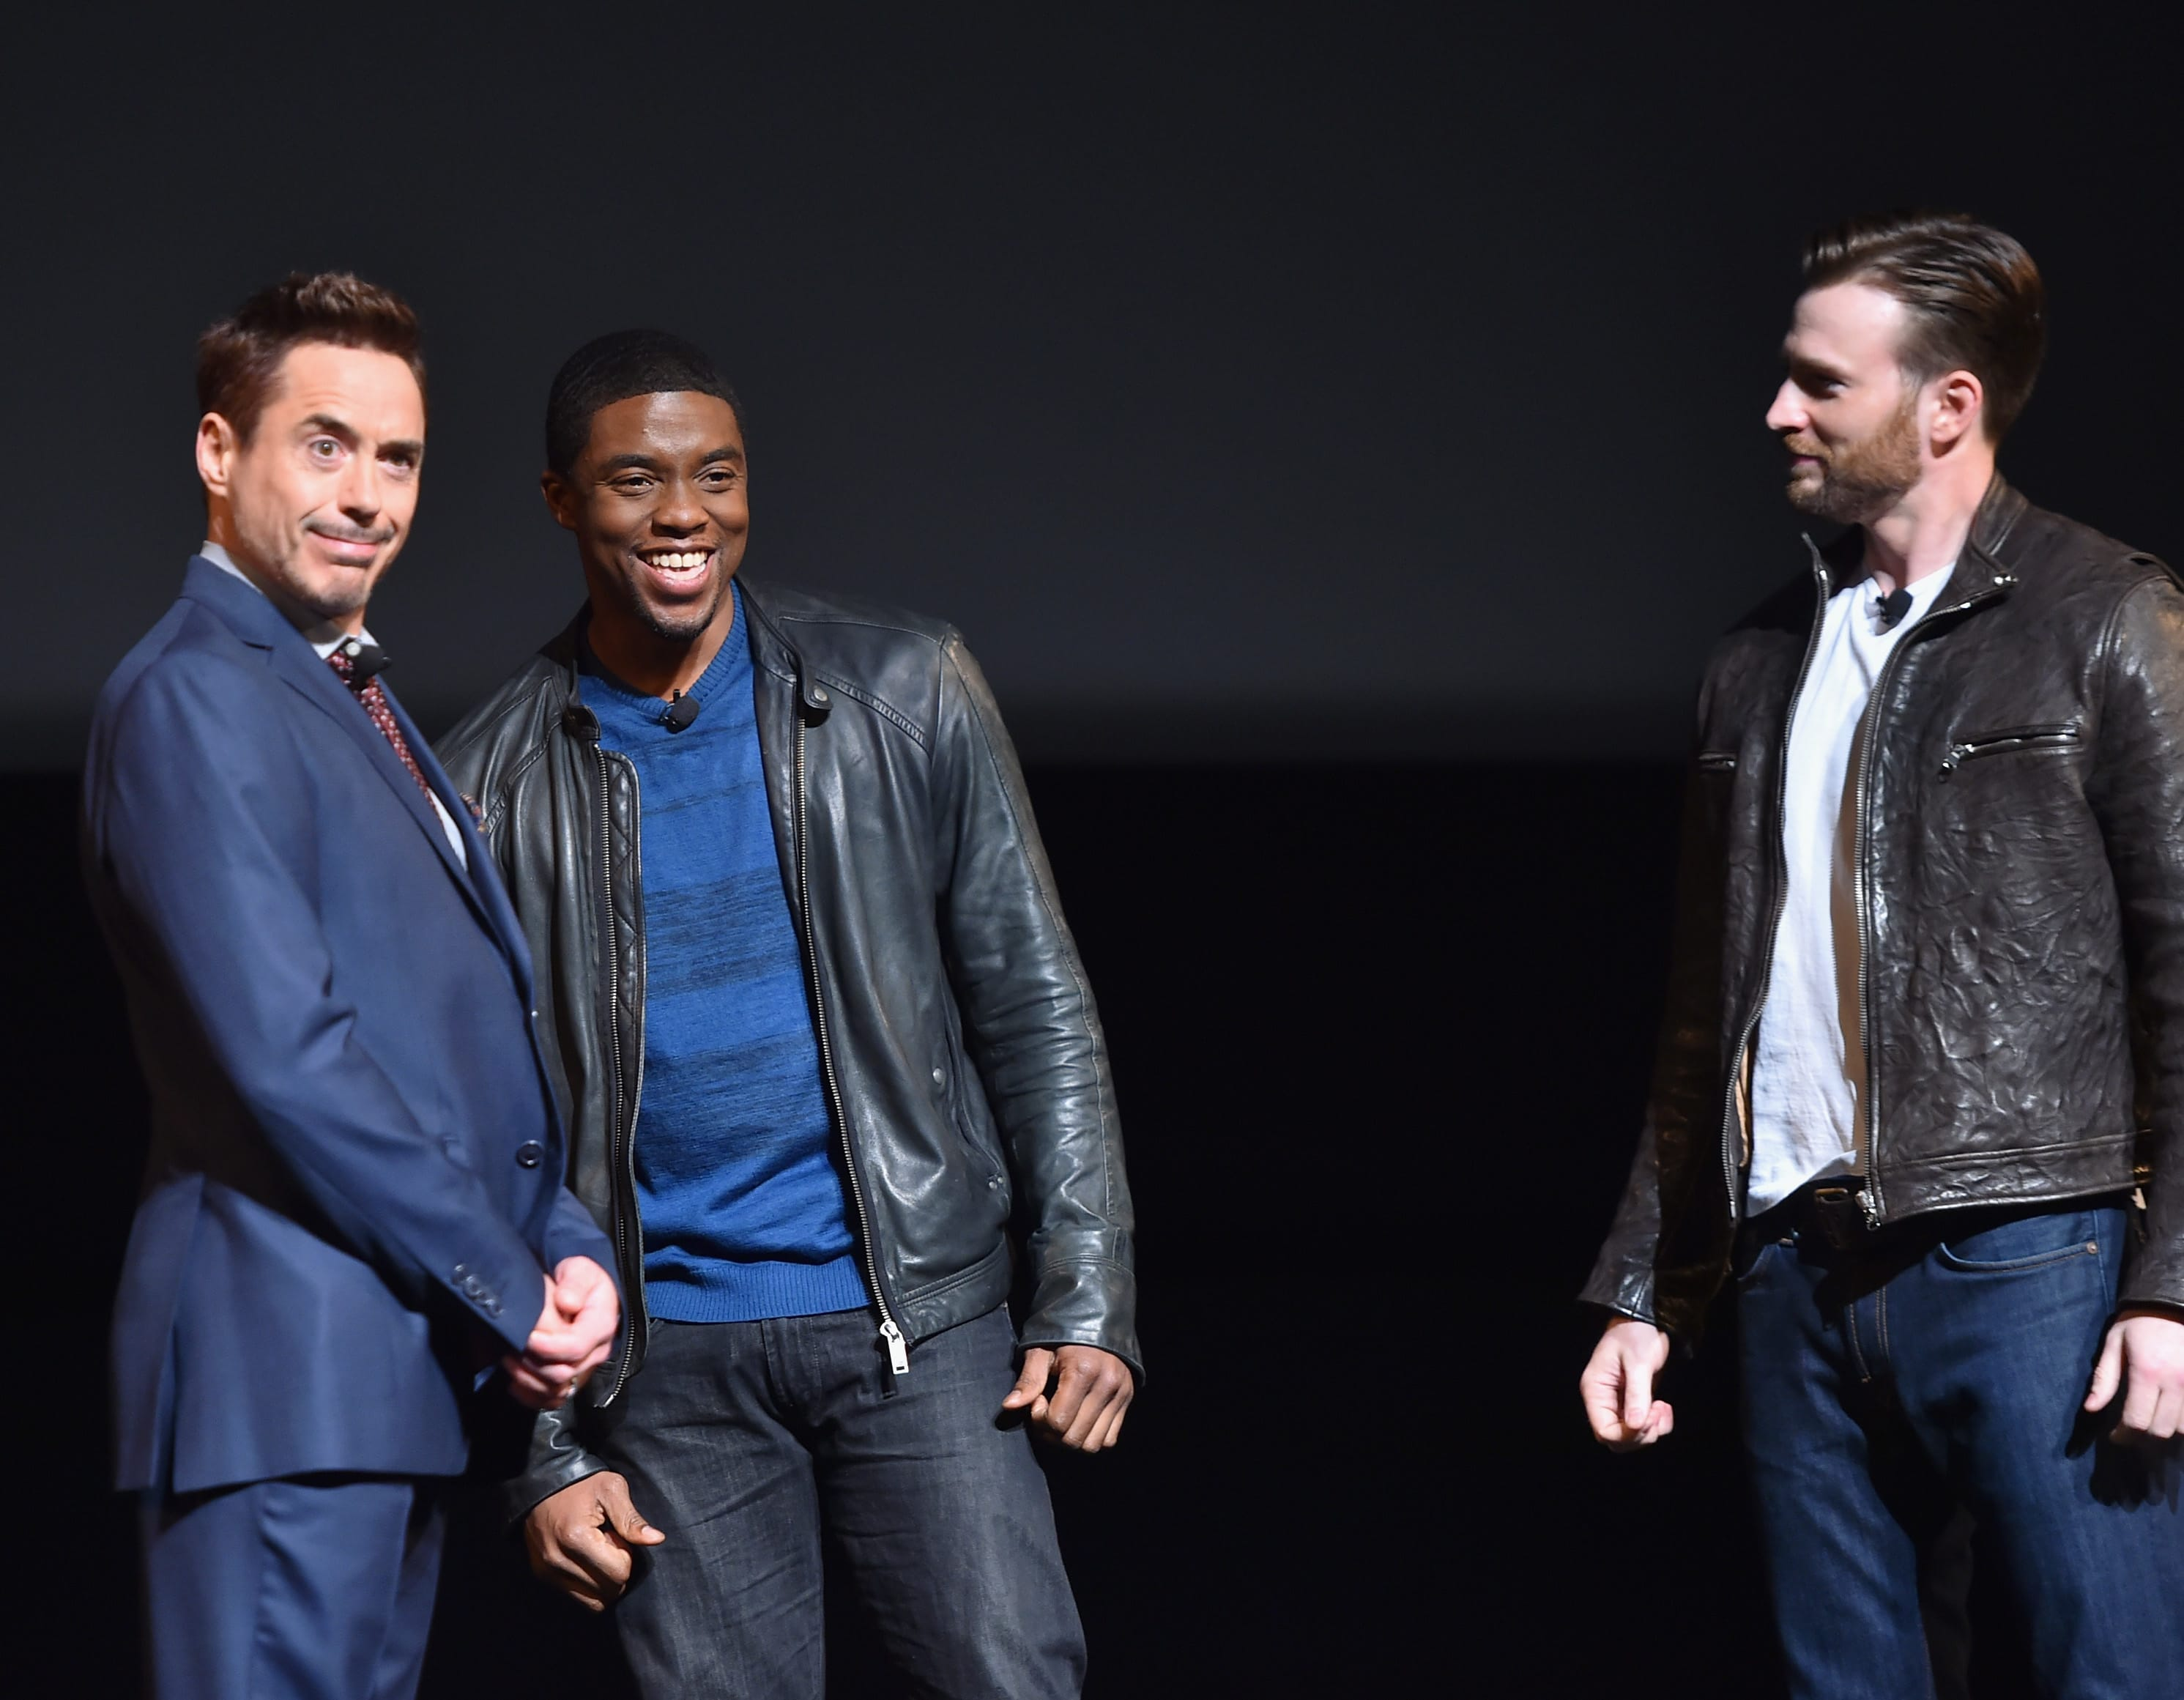 Robert Downey Jr Chadwick Boseman and Chris Evans